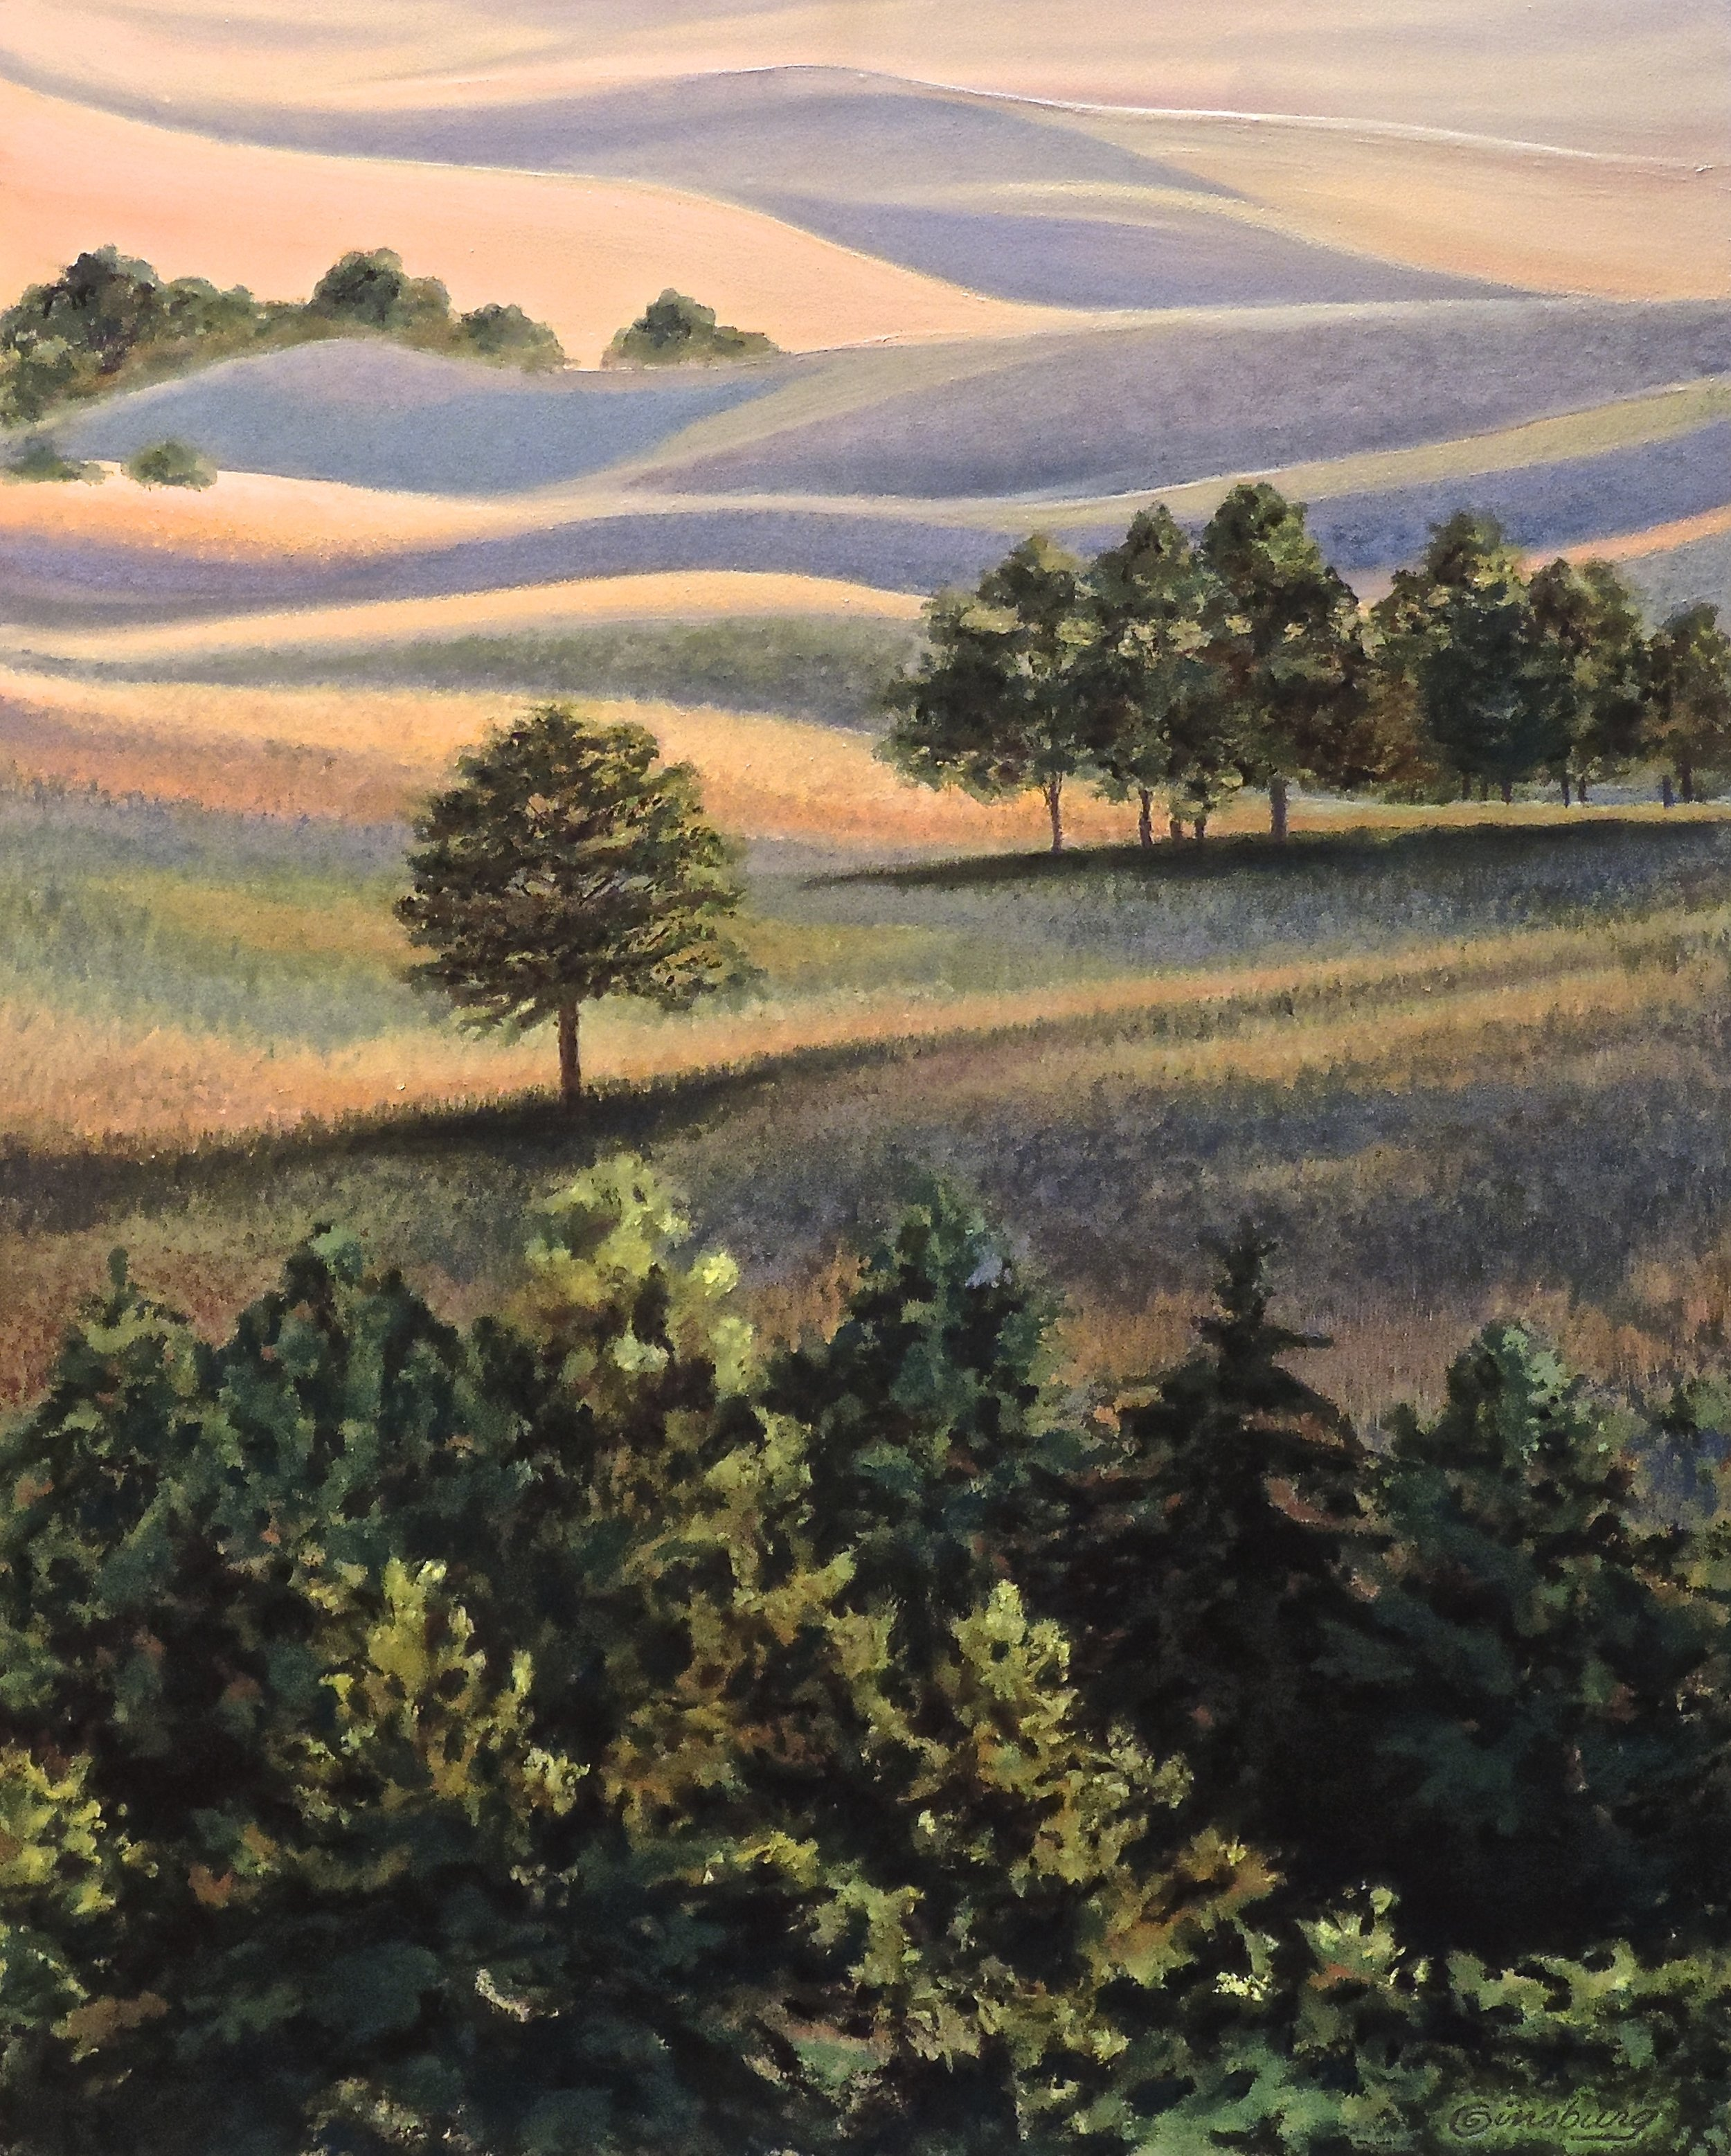 """SANDHILLS SOLITUDE"", HALSEY NATIONAL FOREST, HALSEY, NEBRASKA  Pastel Cheri GInsburg ©"